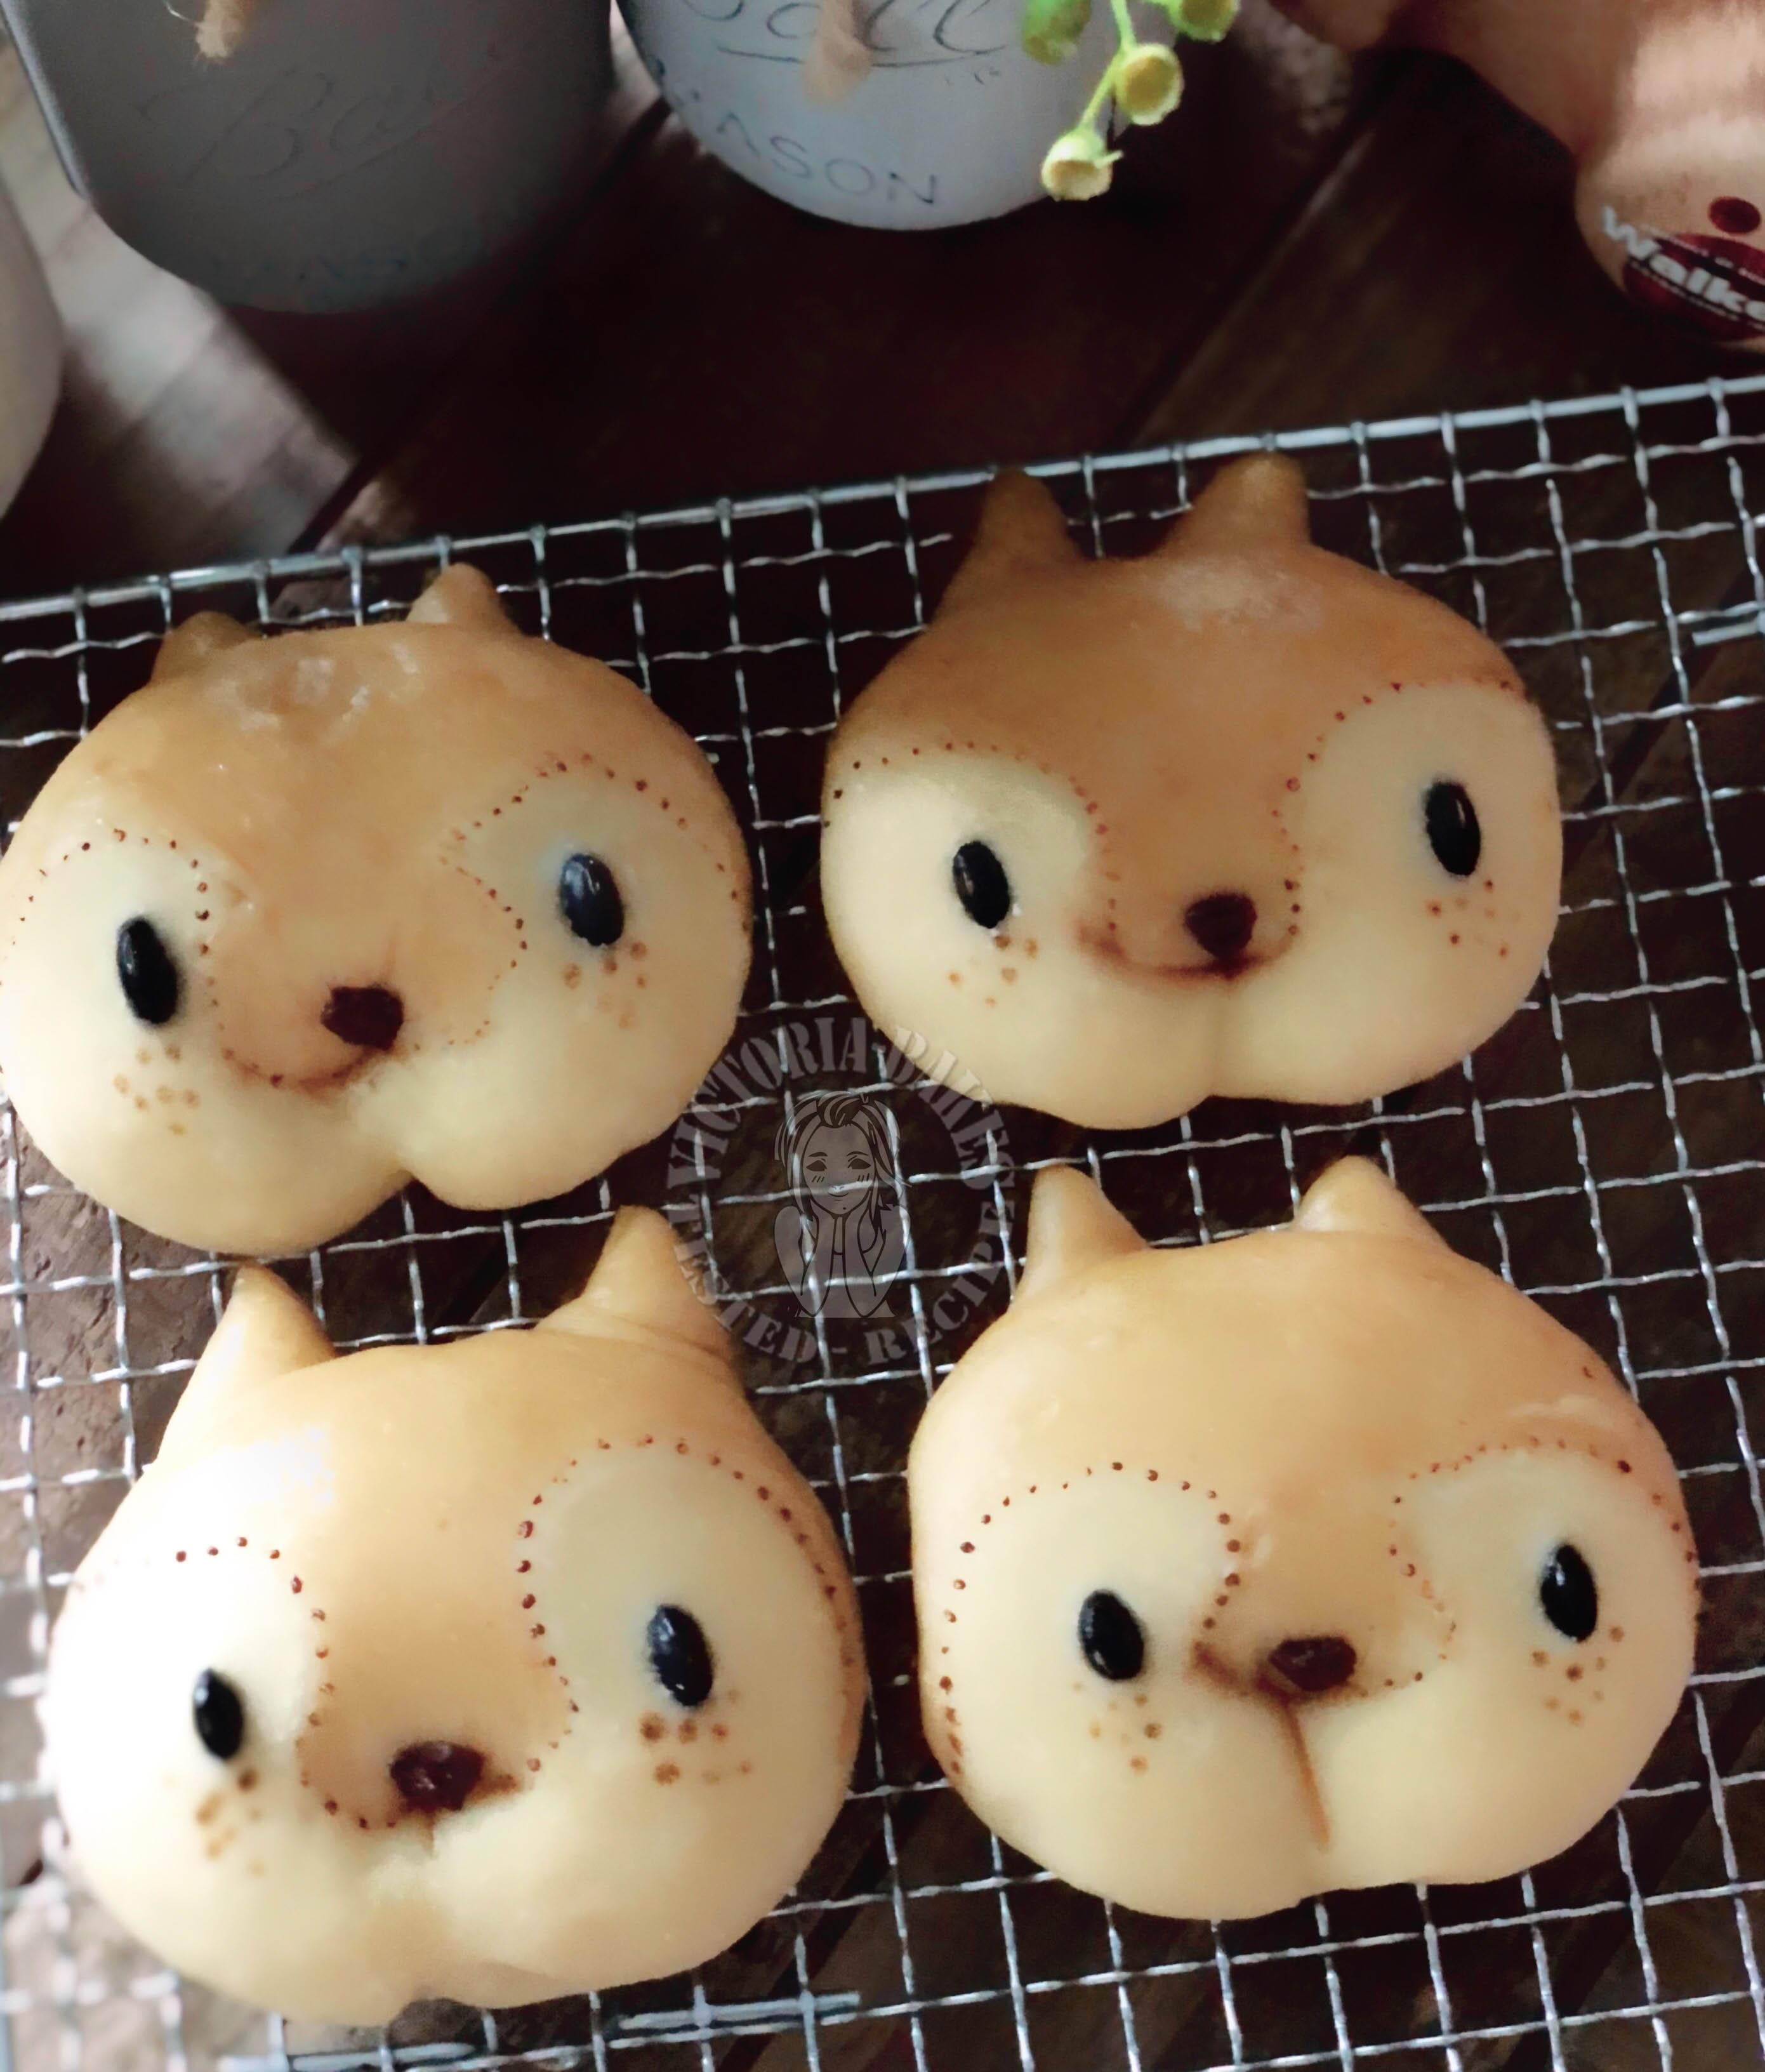 chipmunk japanese haiji bun 花栗鼠日式海蒂白面包